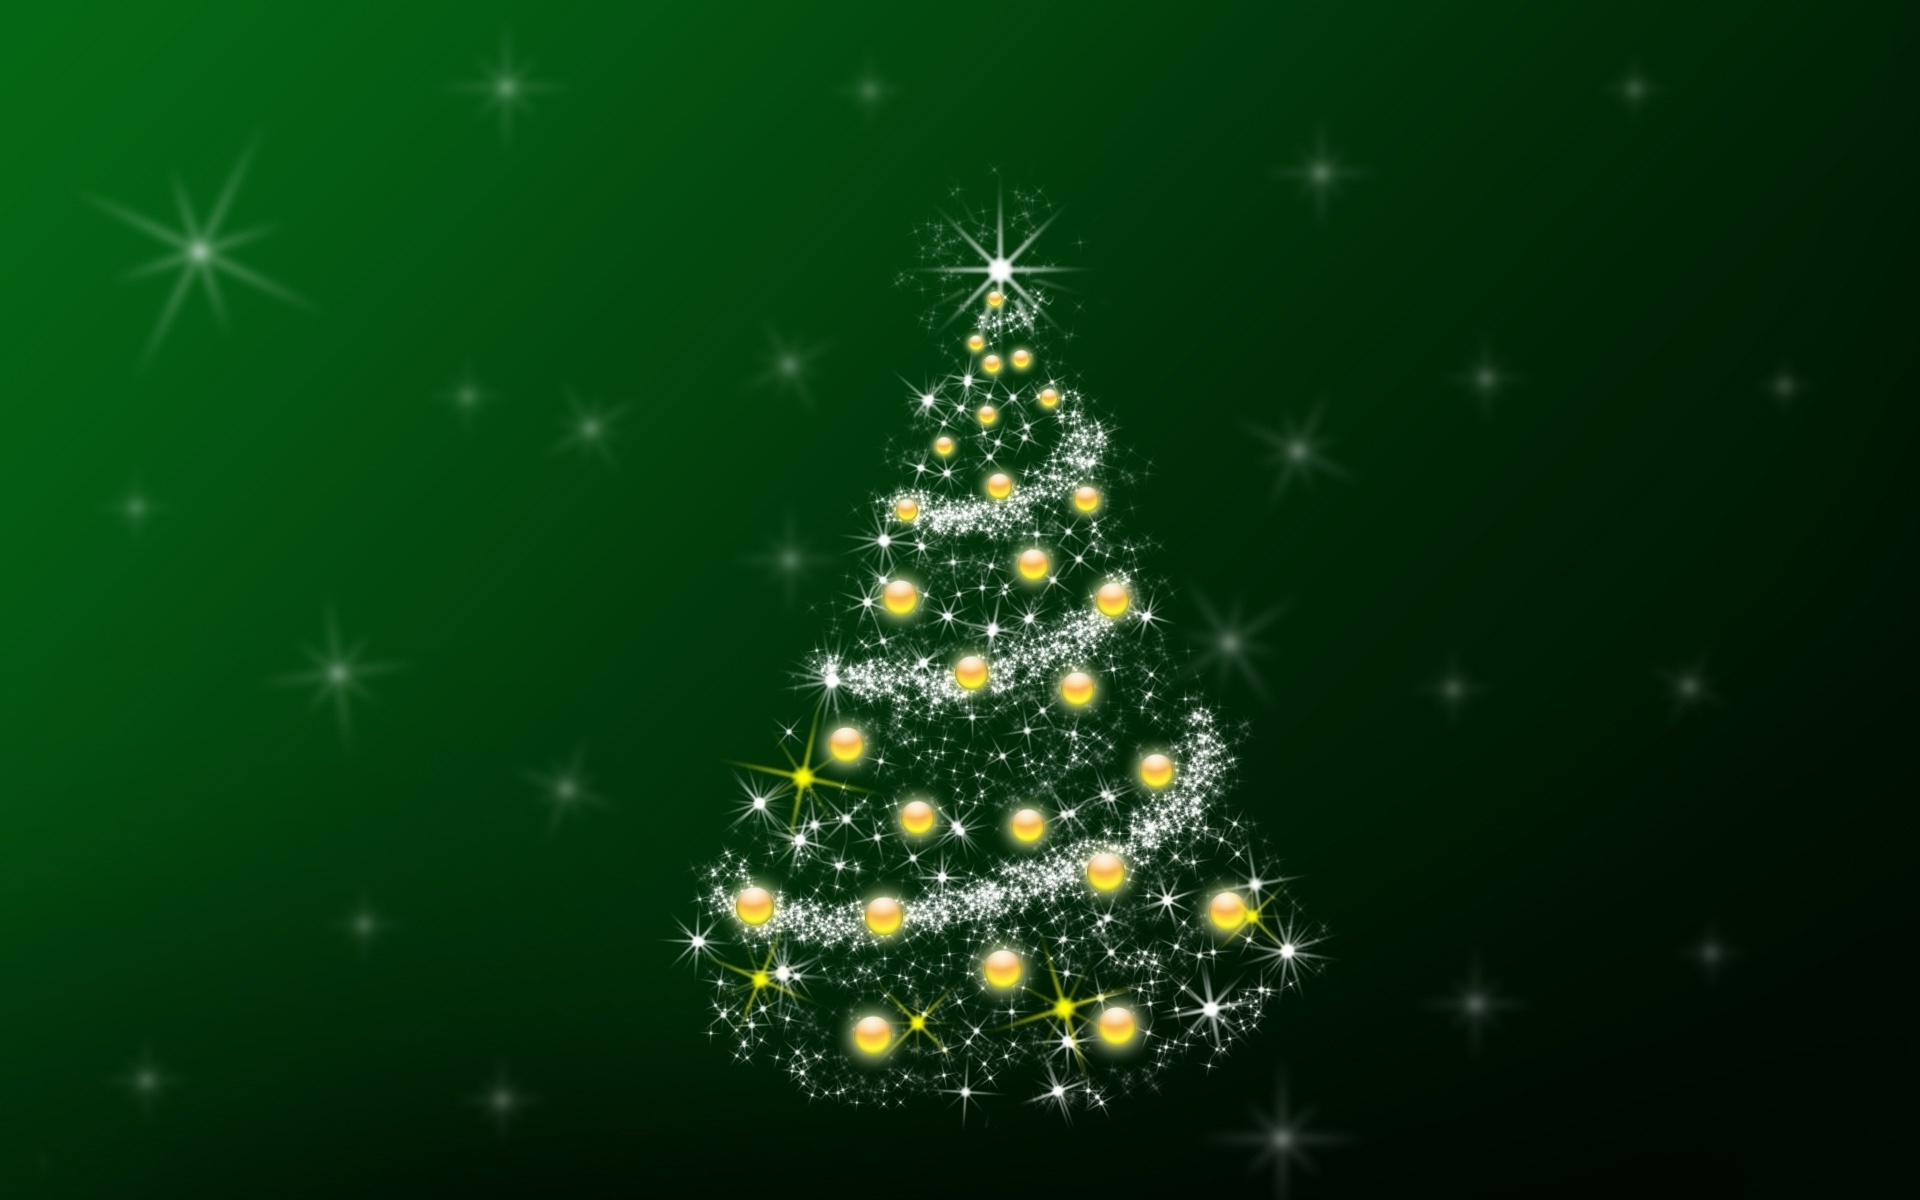 Free Animated Christmas Wallpaper for Desktop (8)